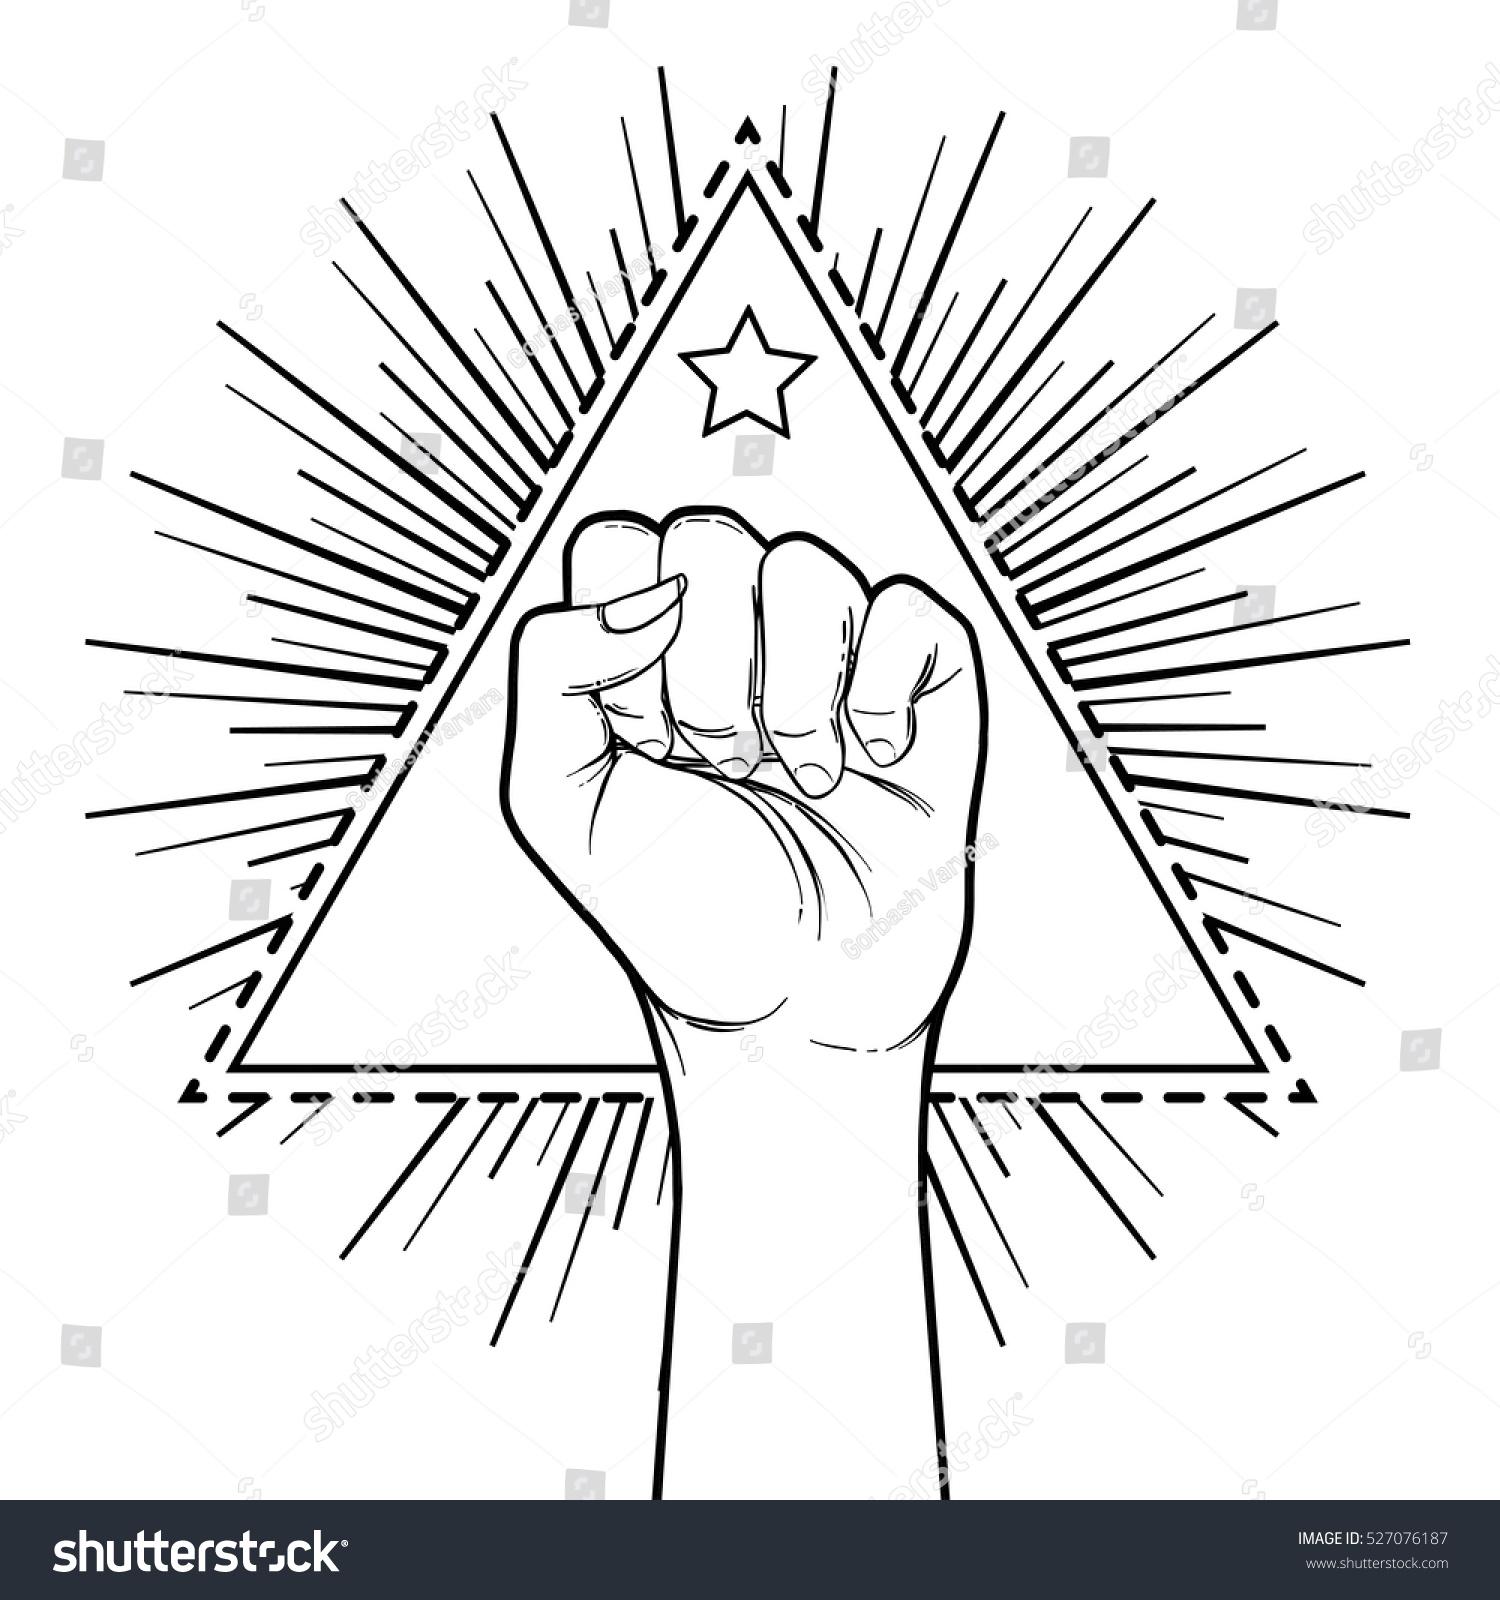 Human hand raised over triangle shape stock vector 527076187 human hand raised up over triangle shape with rays symbol of fighting revolution buycottarizona Images